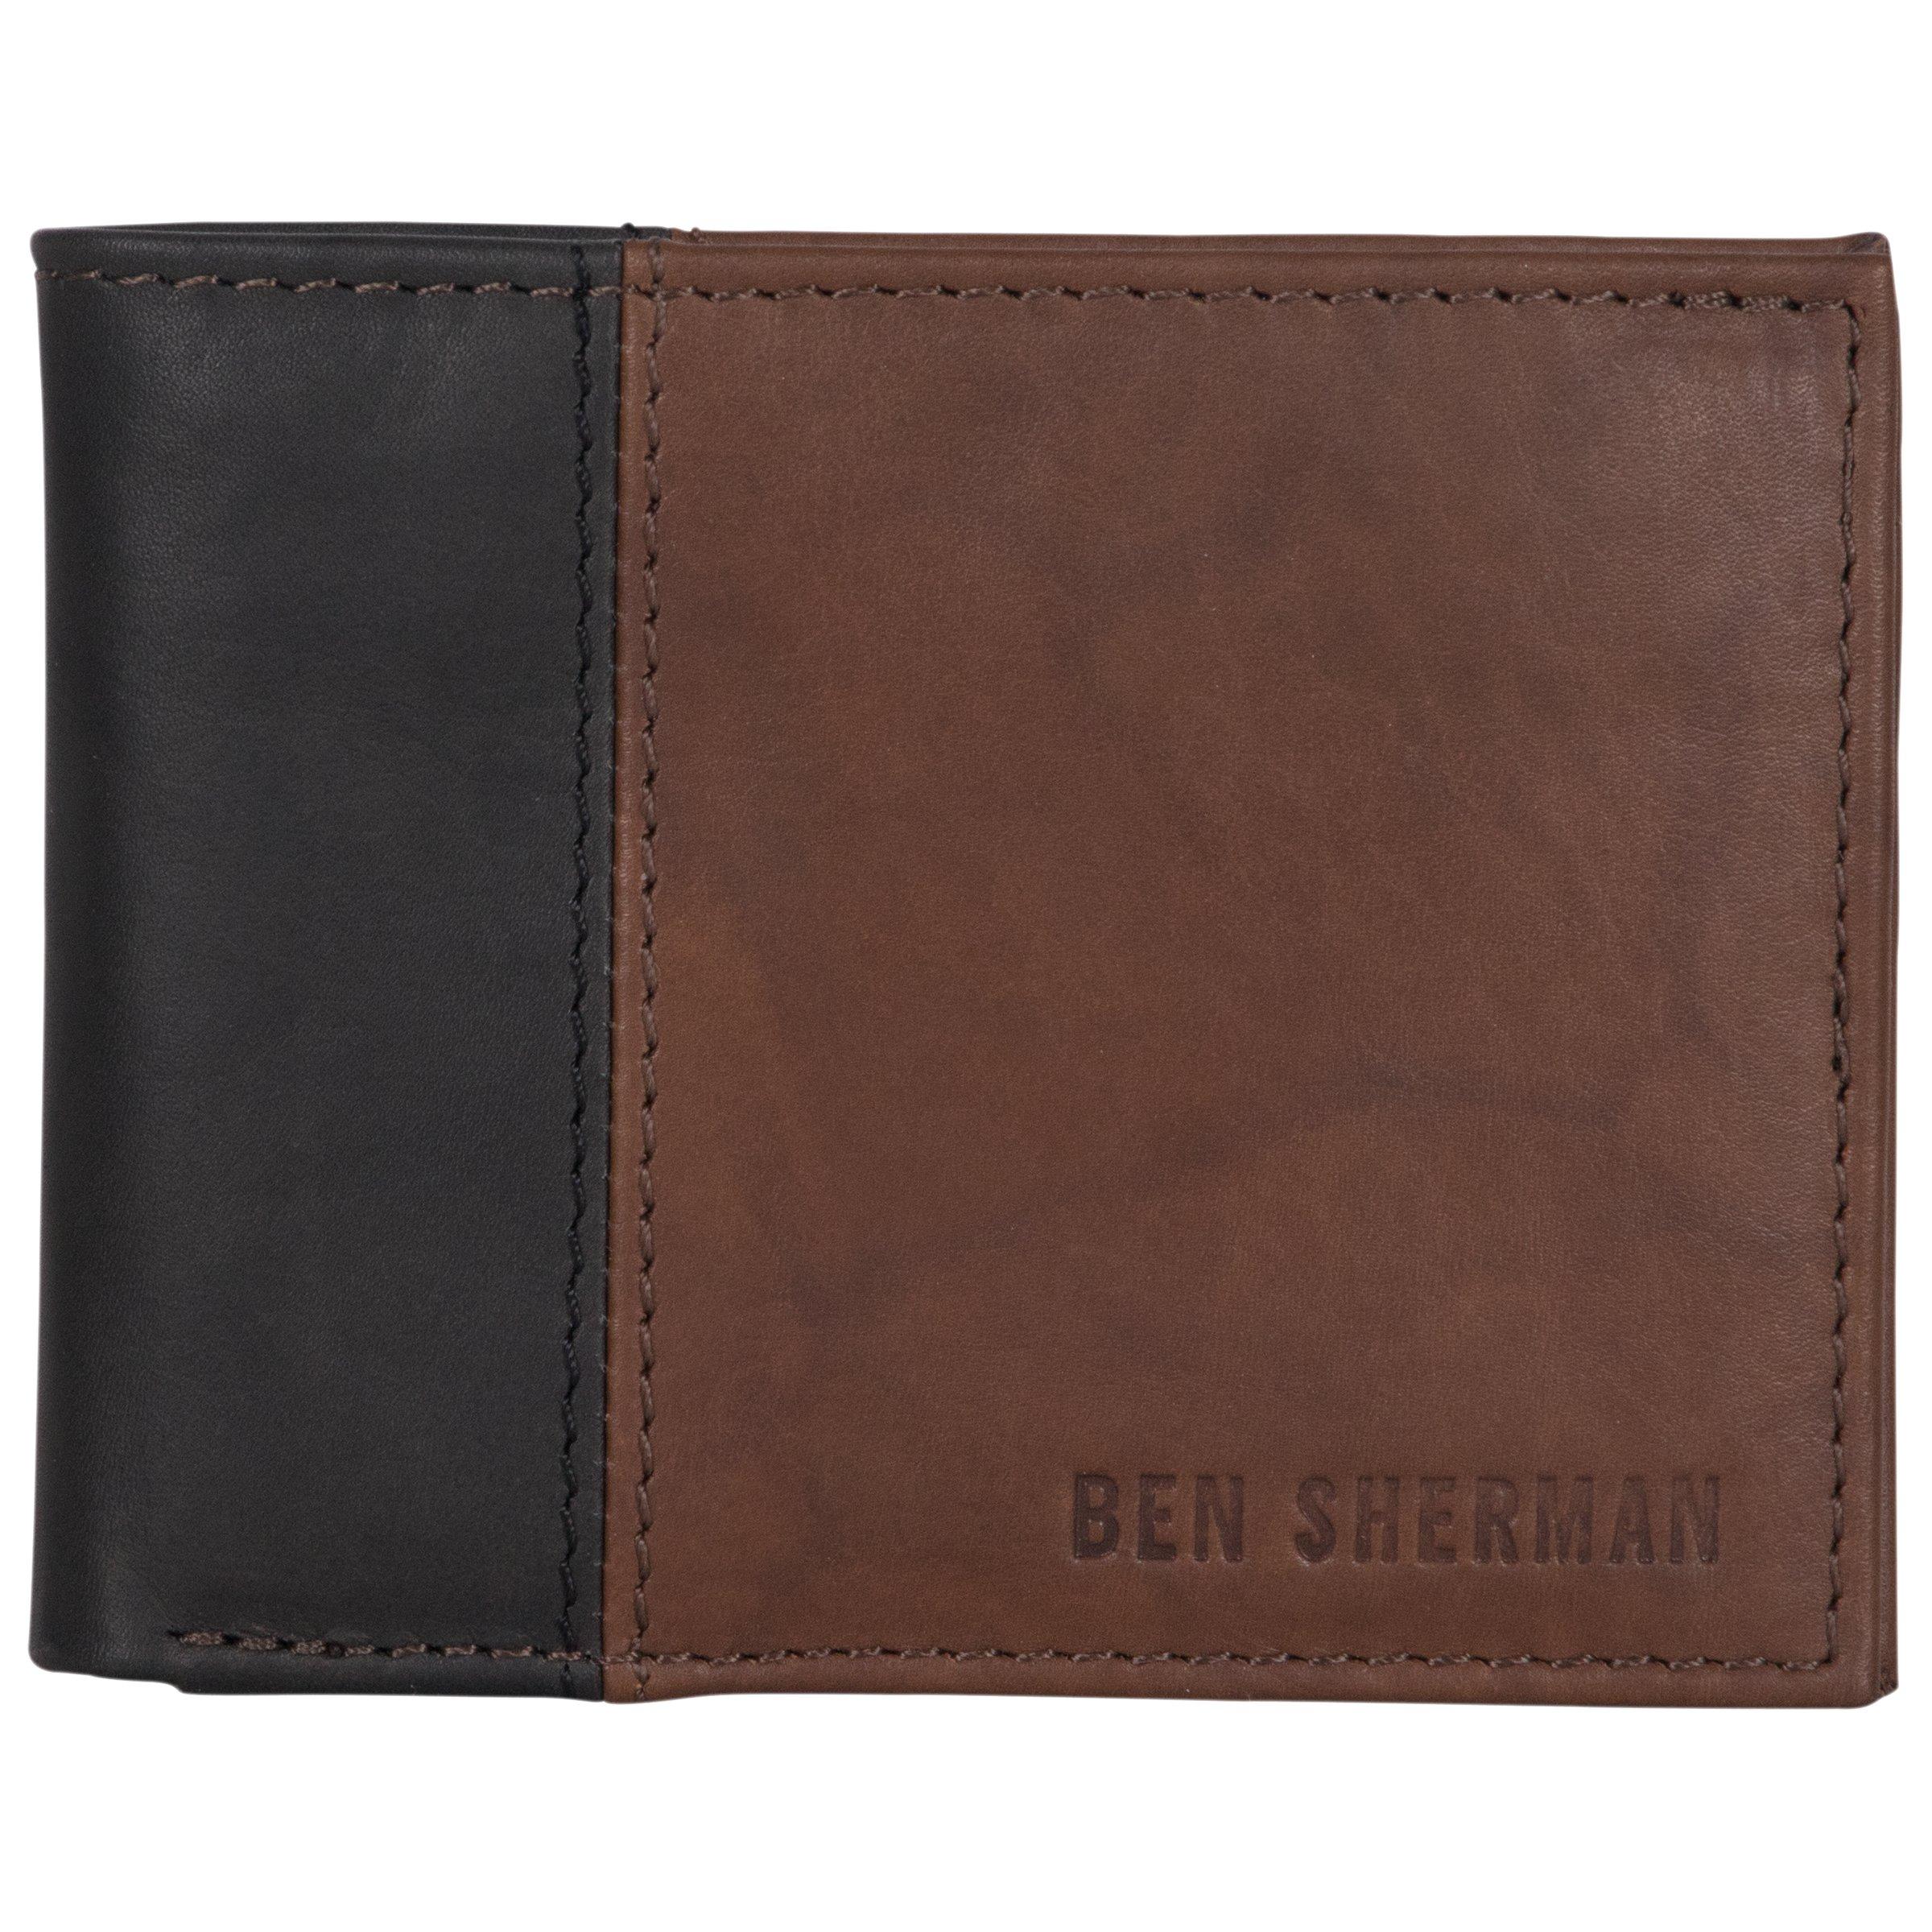 Ben Sherman Men's Leather Five Pocket Bi-Fold Wallet with Id Window (Rfid), Brown with Black Color Block